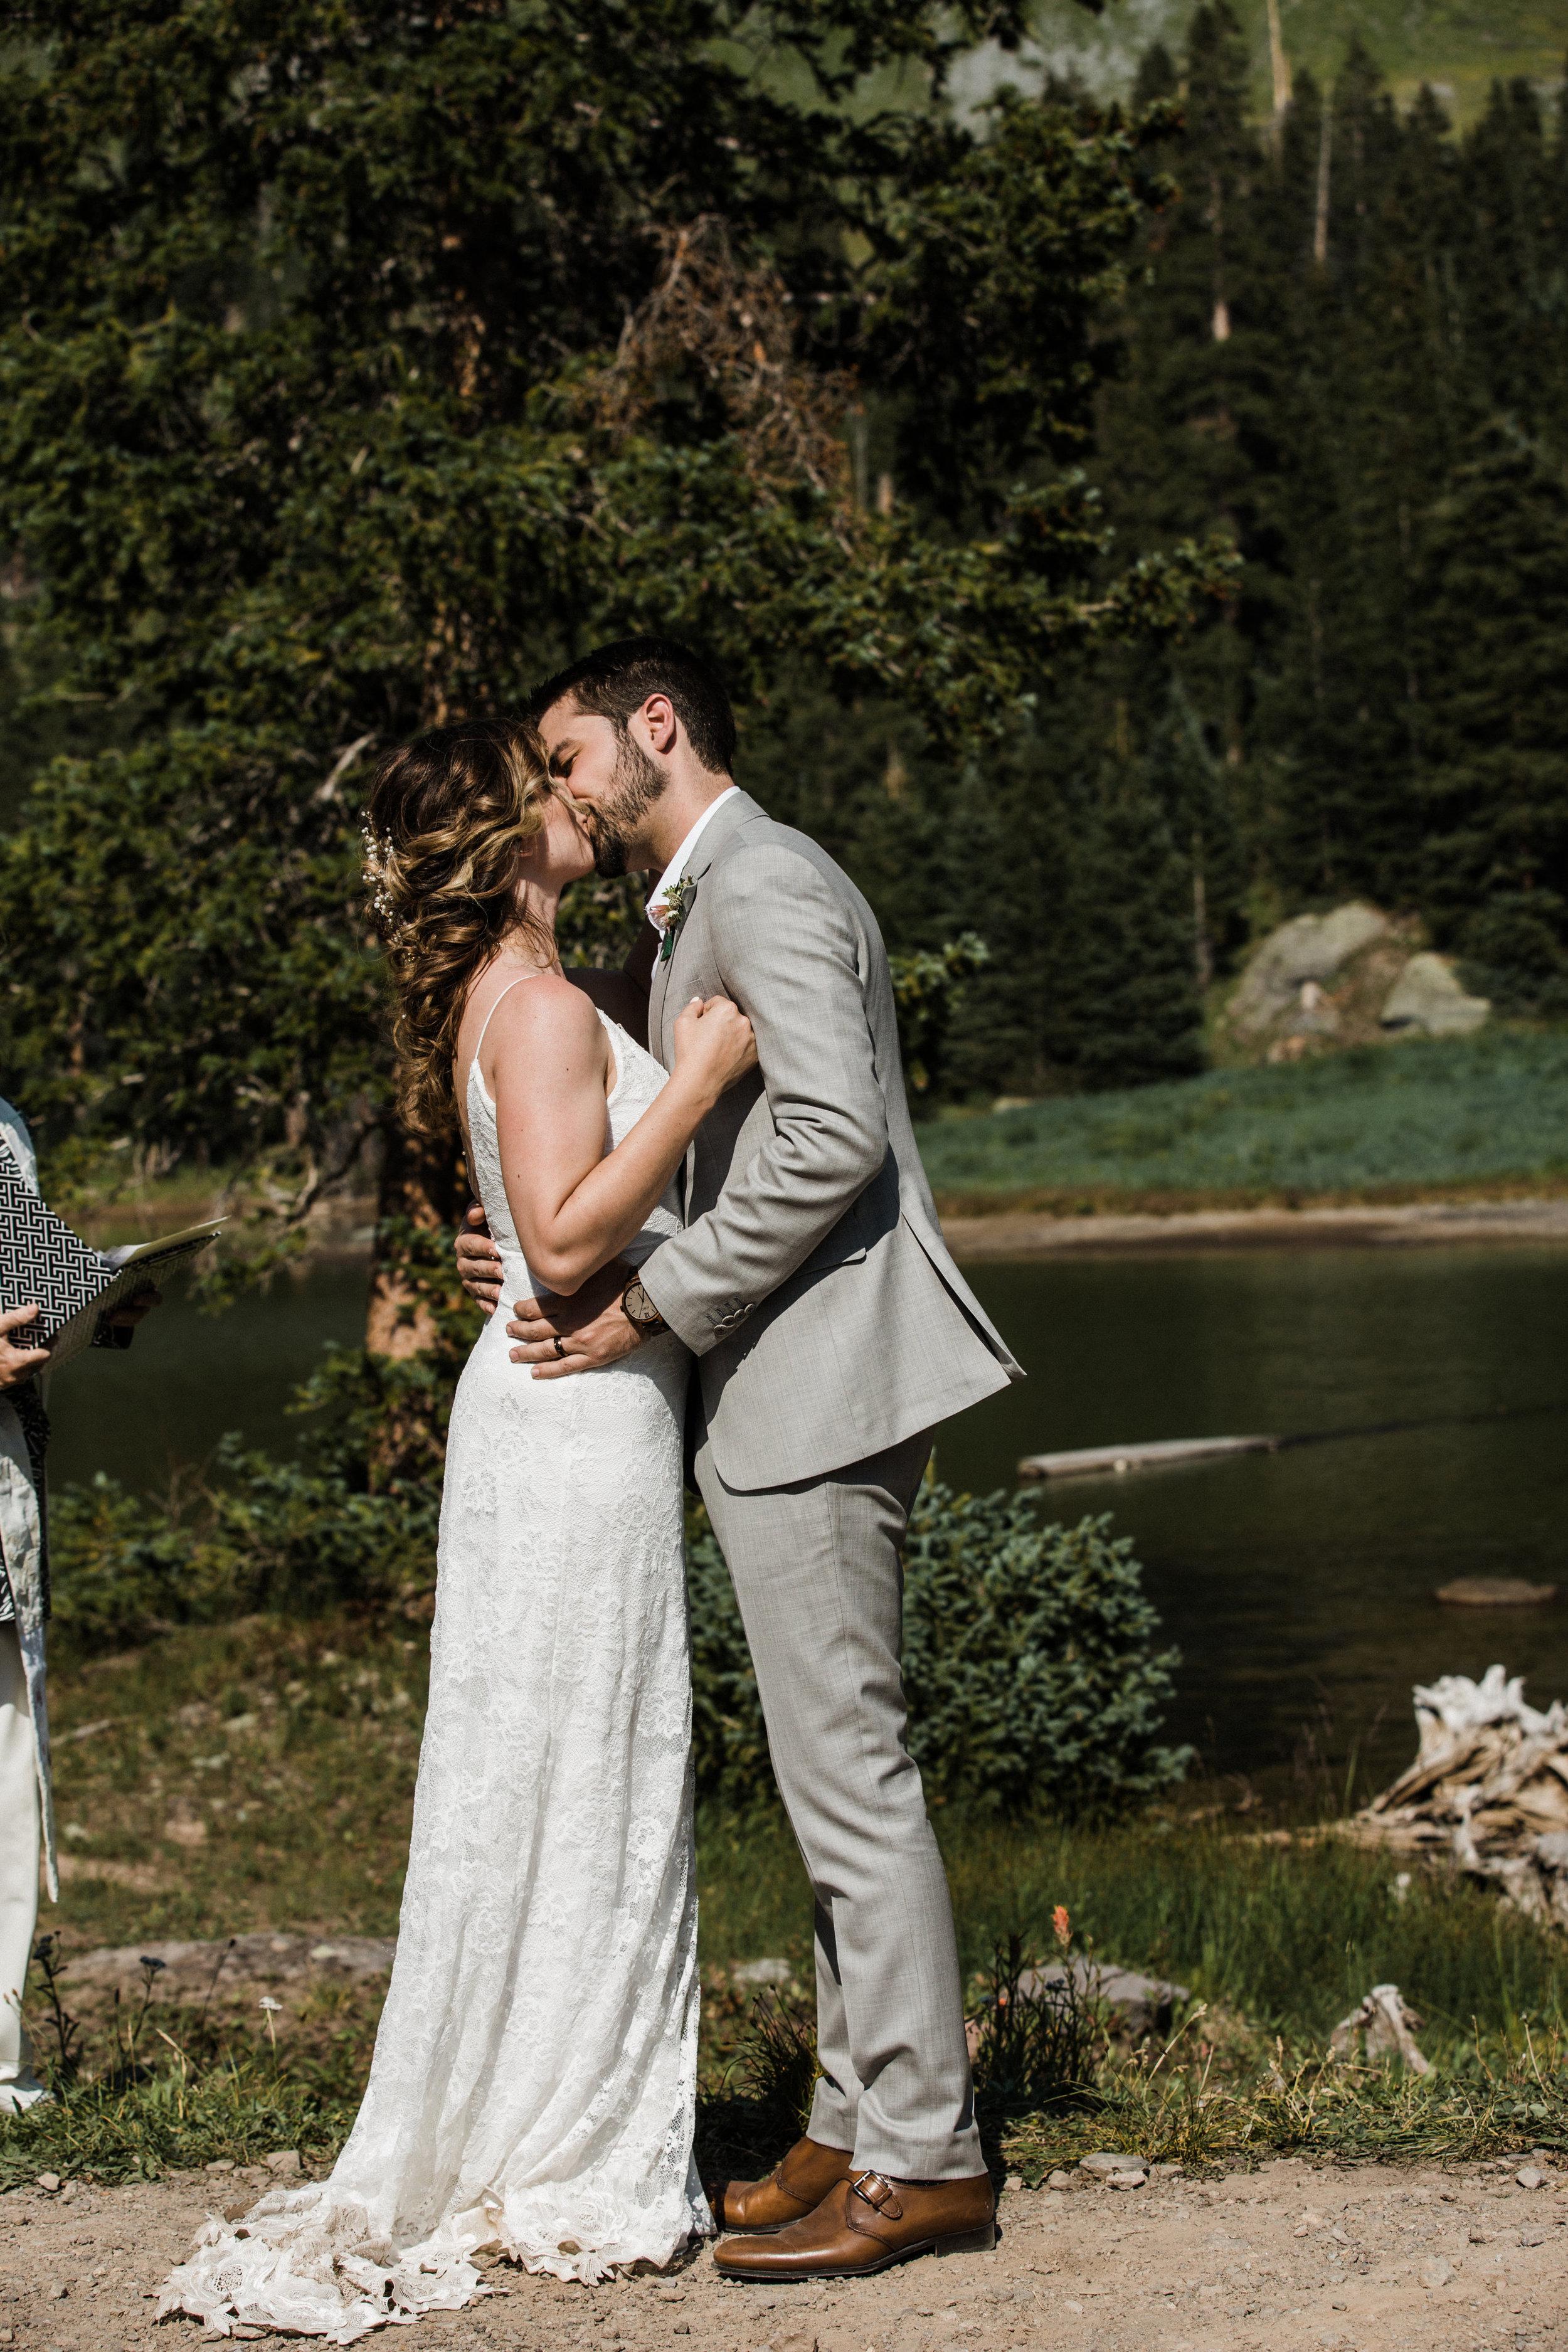 SB-leahandashton-telluride-wedding-photography-0022.jpg